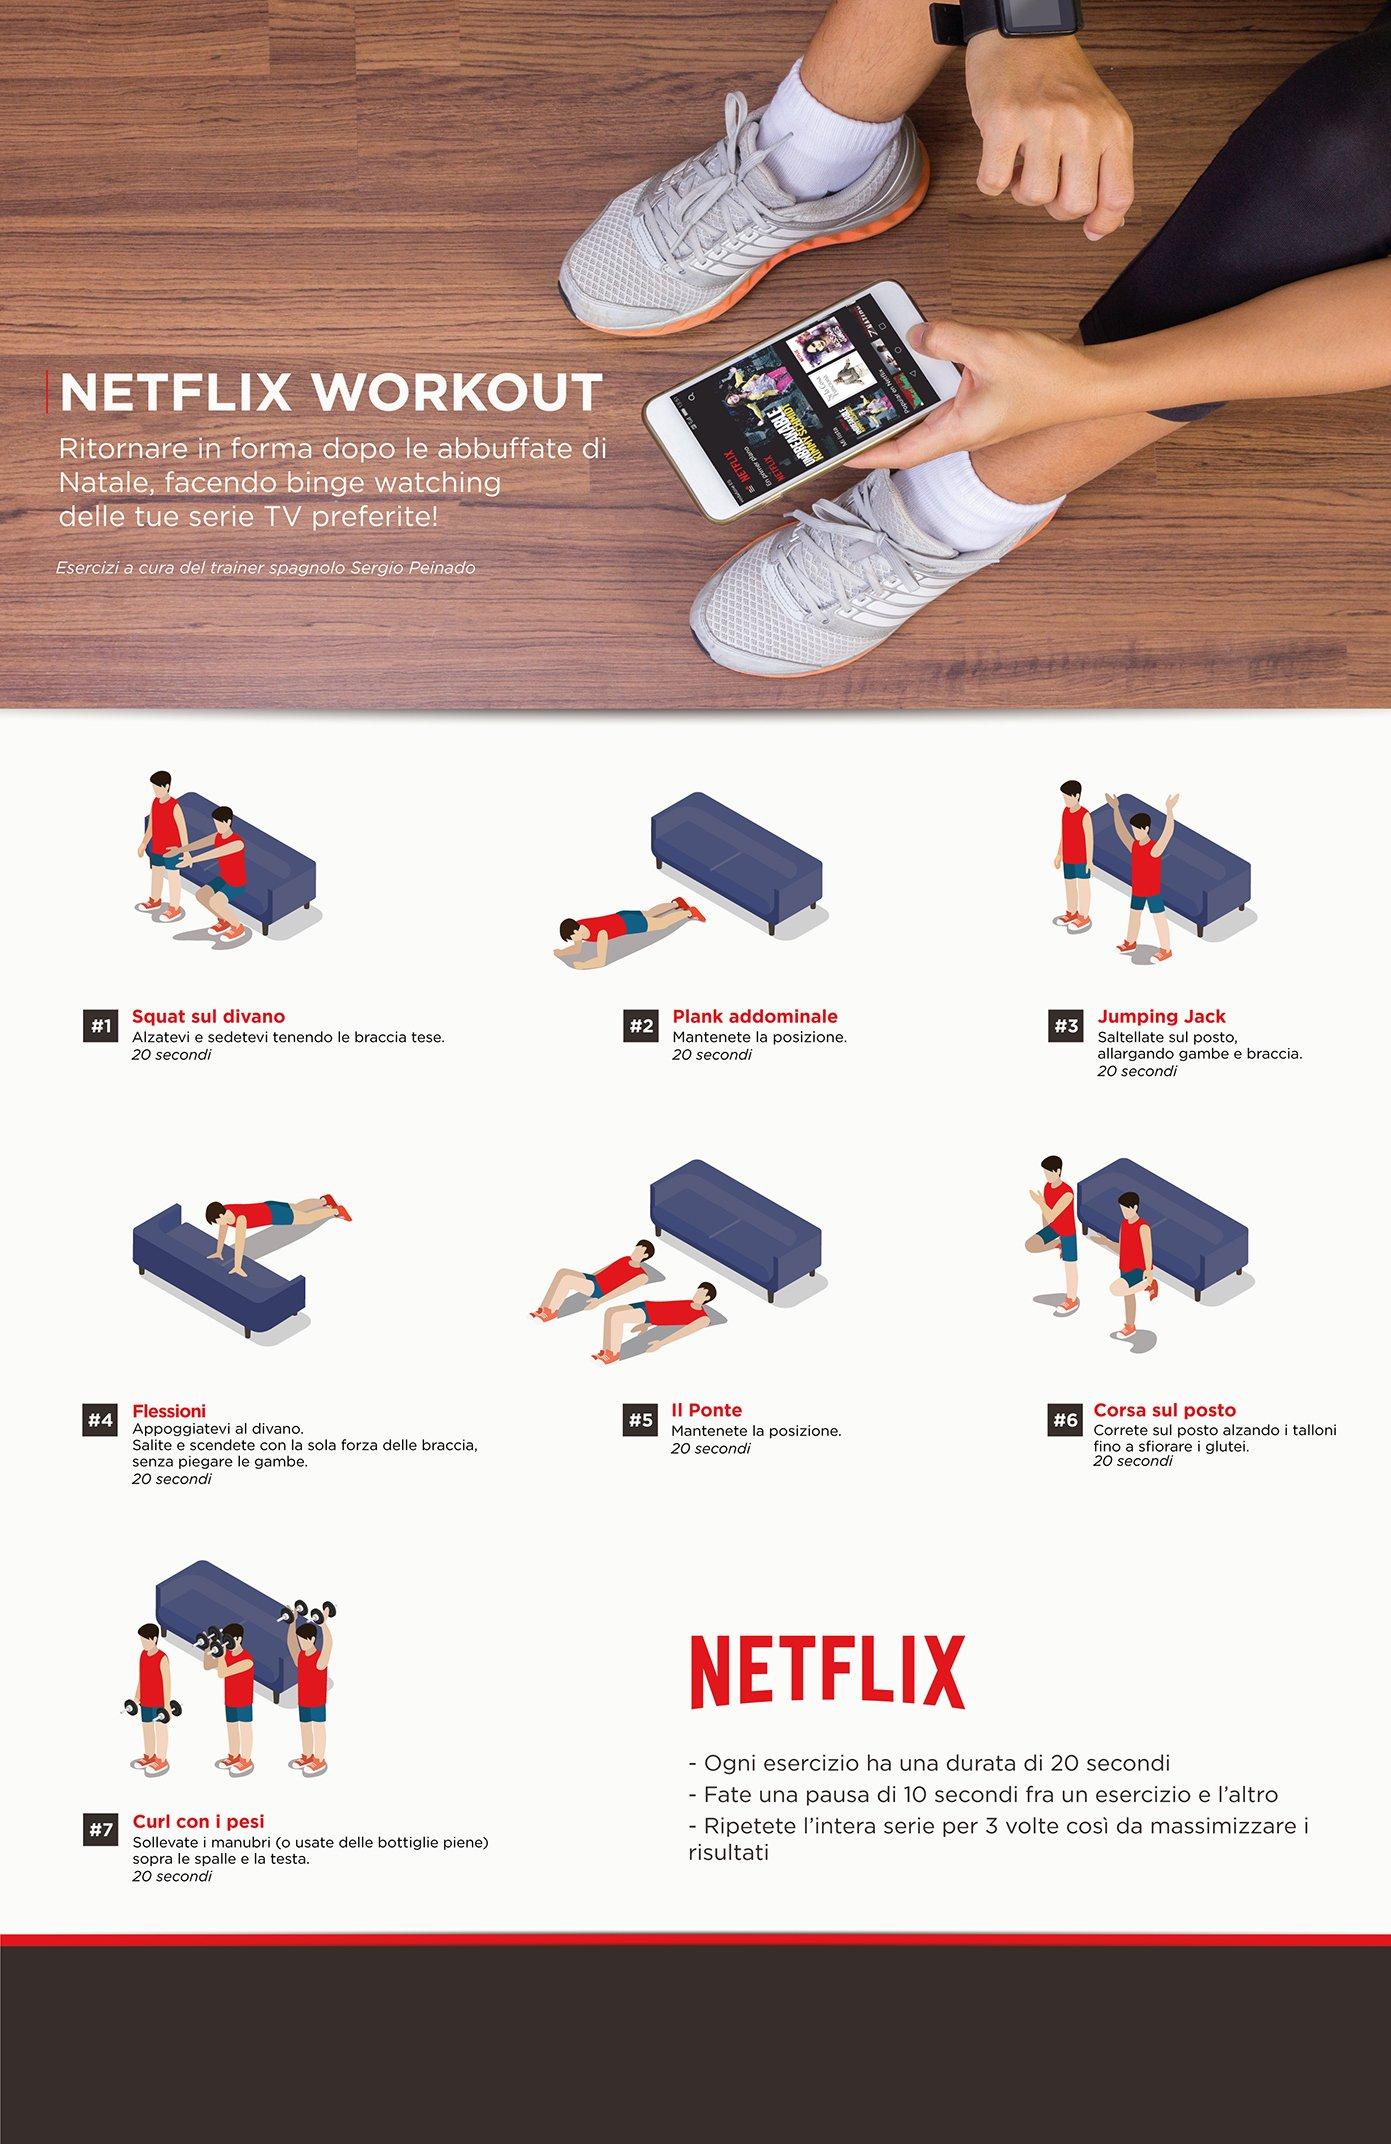 netflix-workout-ita